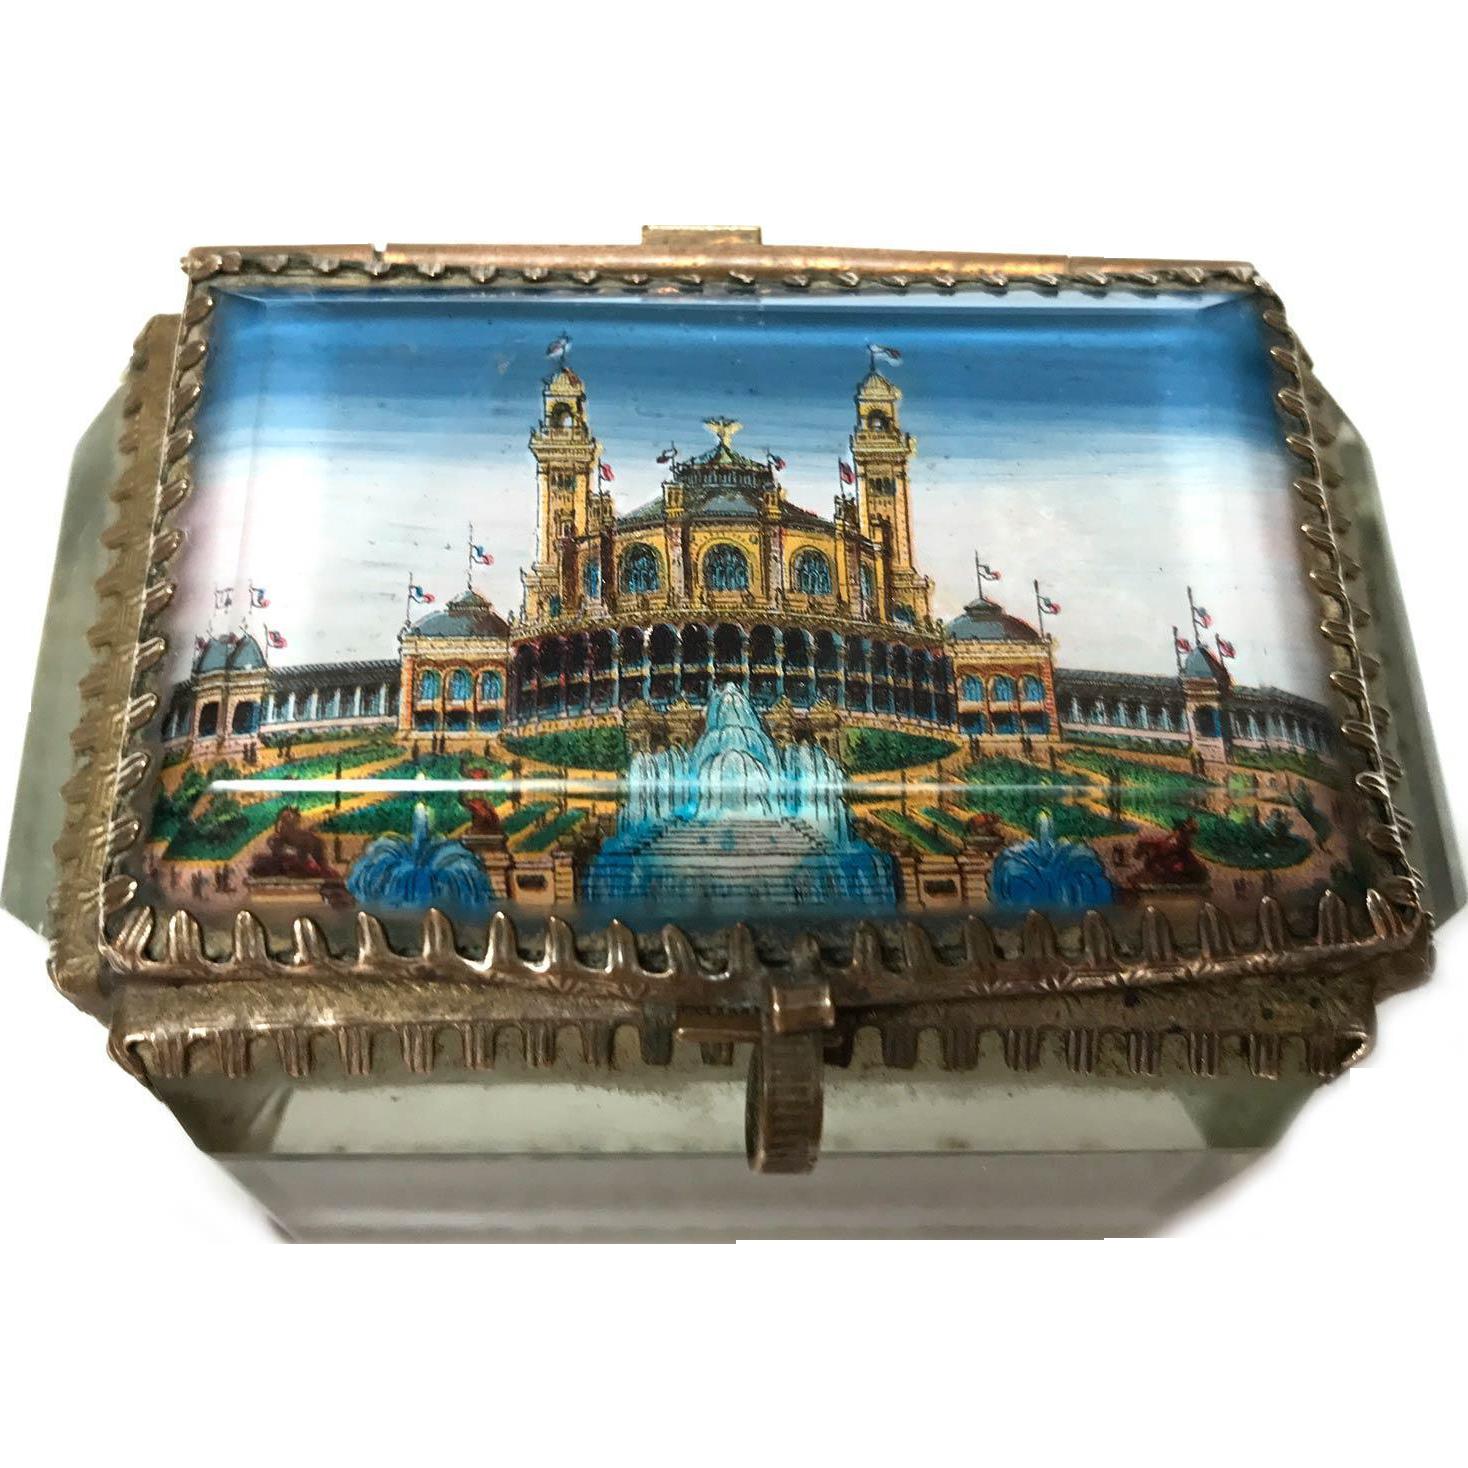 Antique French Beveled Glass Eglomise Trinket Box Grand Palais 1900